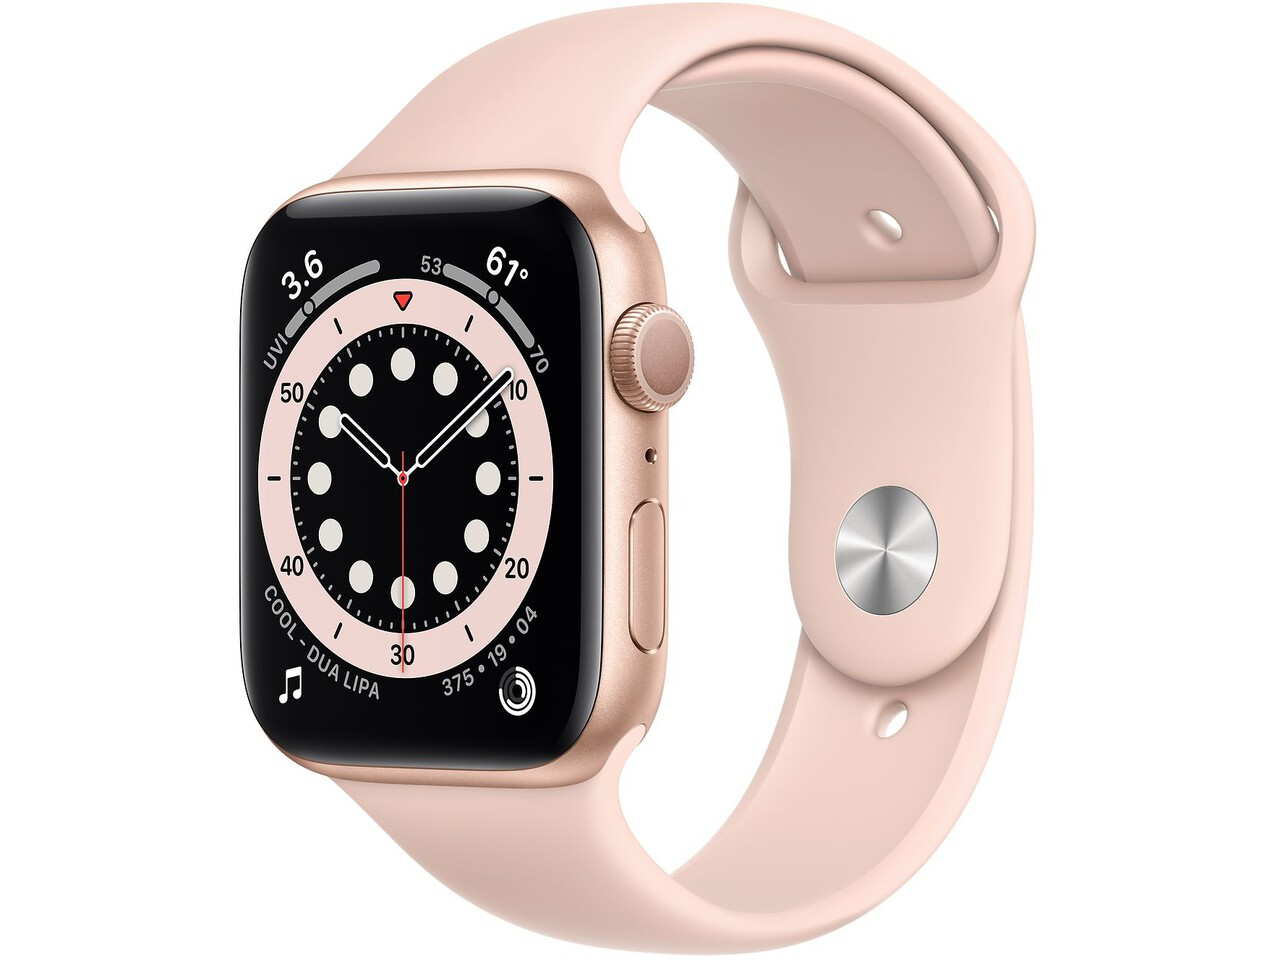 apple watch series 6 cellular 40mm gold aluminum pink sand sport band